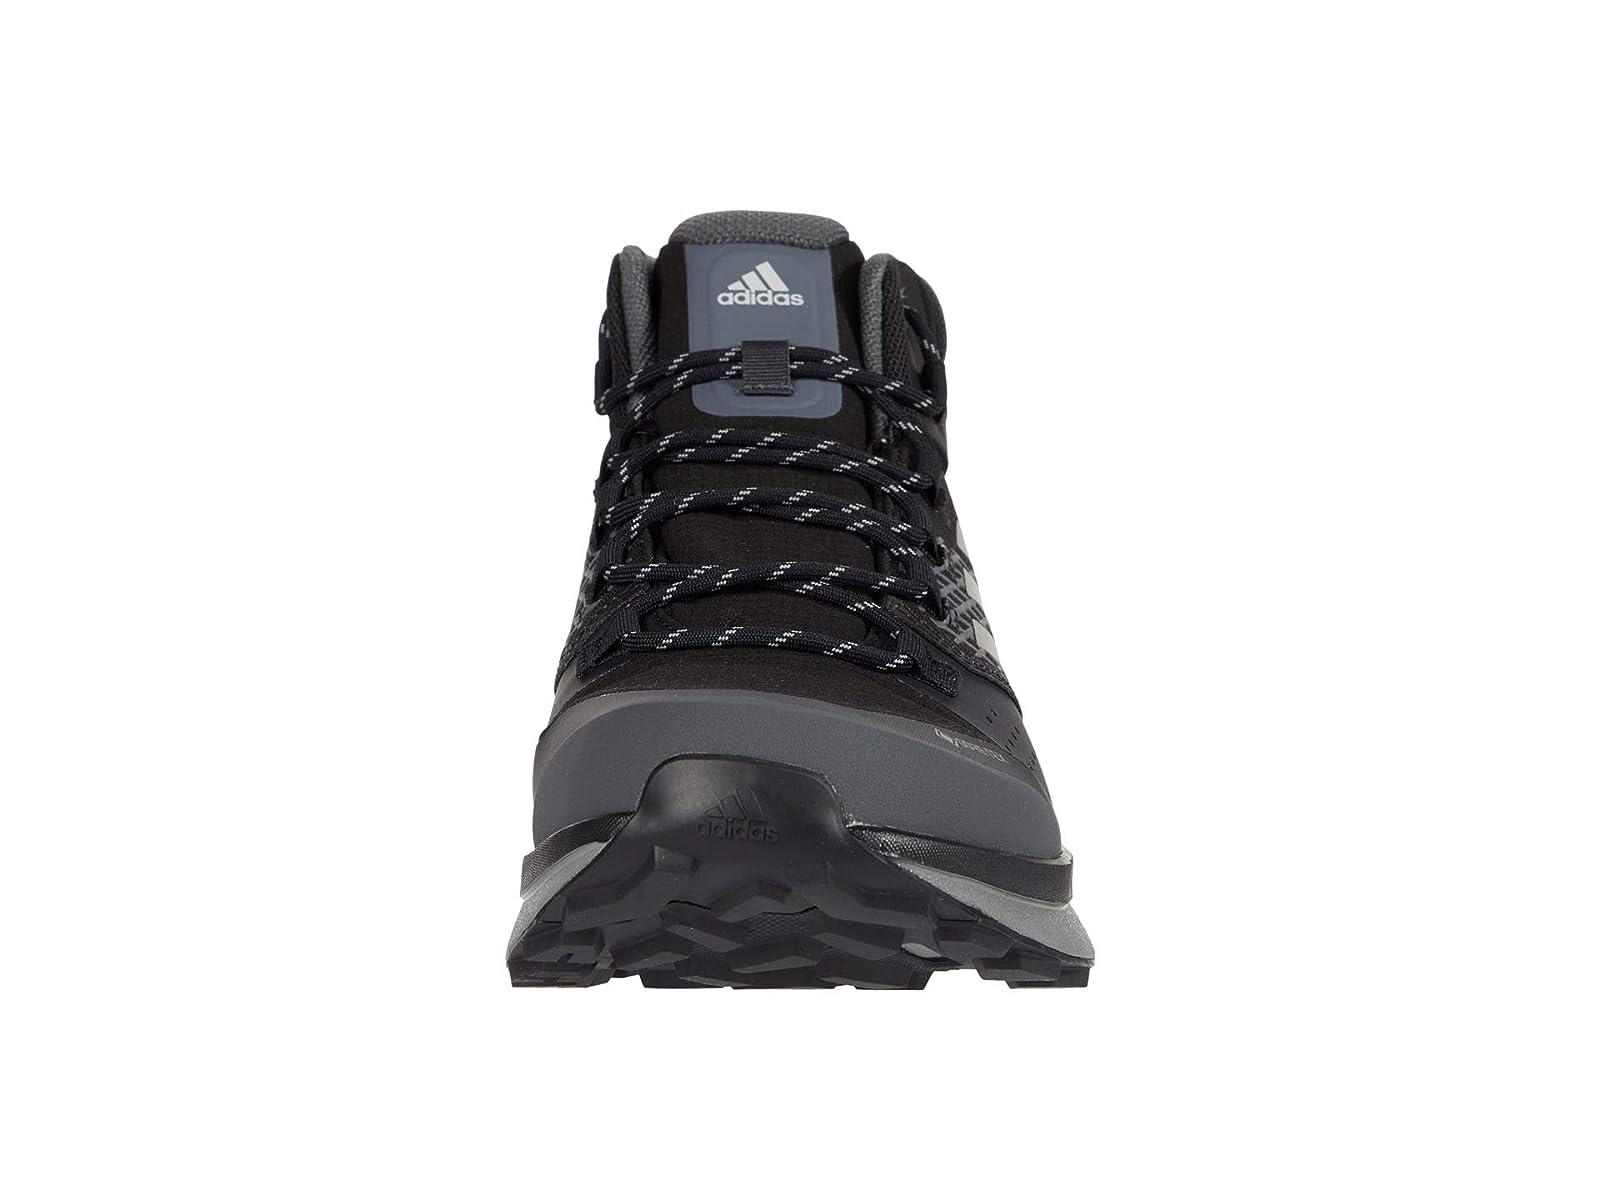 Mannes-Schuhe-Adidas-Outdoor-TERREX-folgian-Hiker-Mid-GTX Indexbild 8